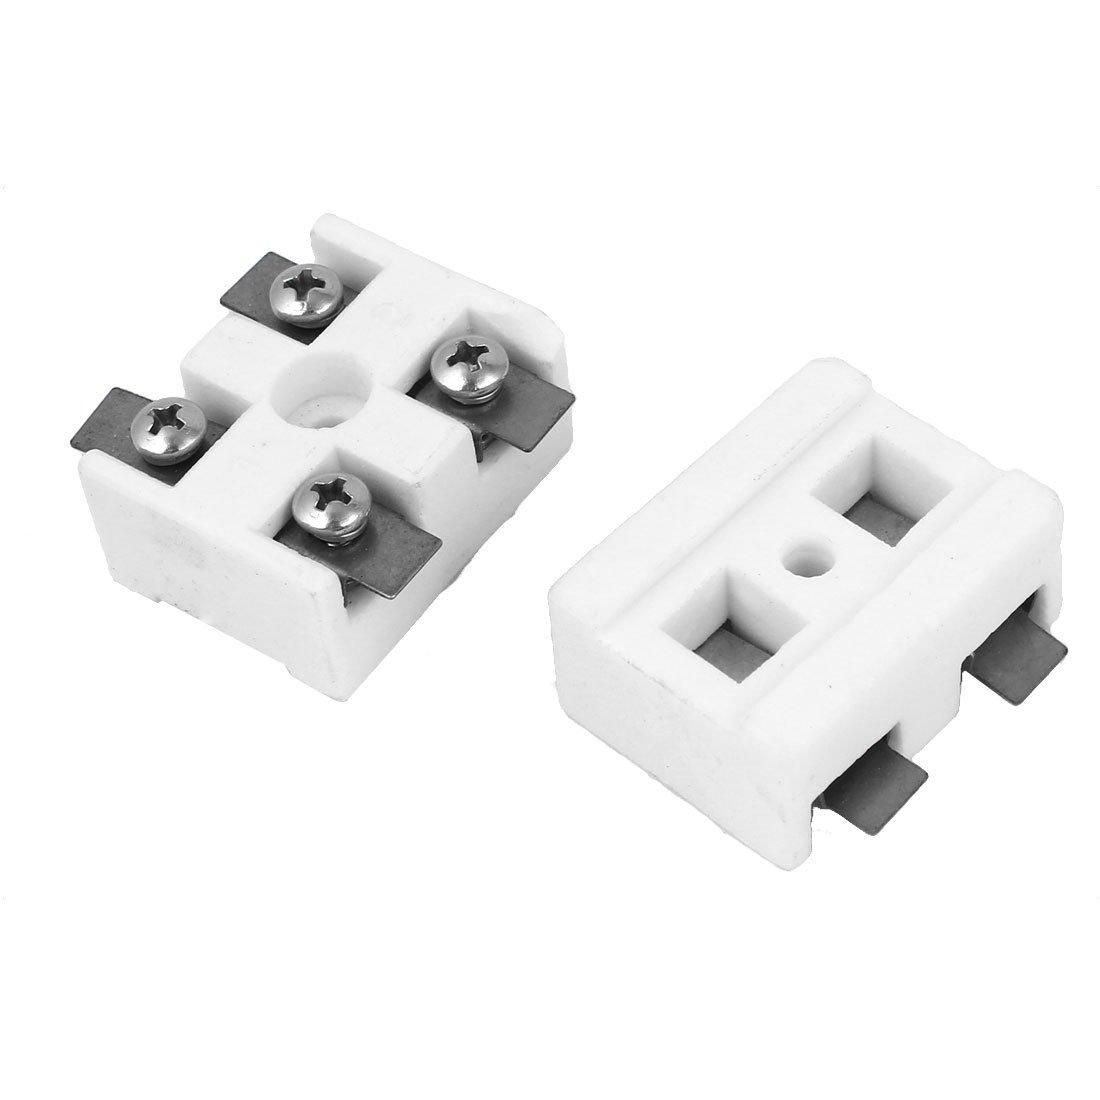 uxcell High Temperature 5 Holes Ceramic Terminal Block White 30A 2 Pcs a16031100ux0316